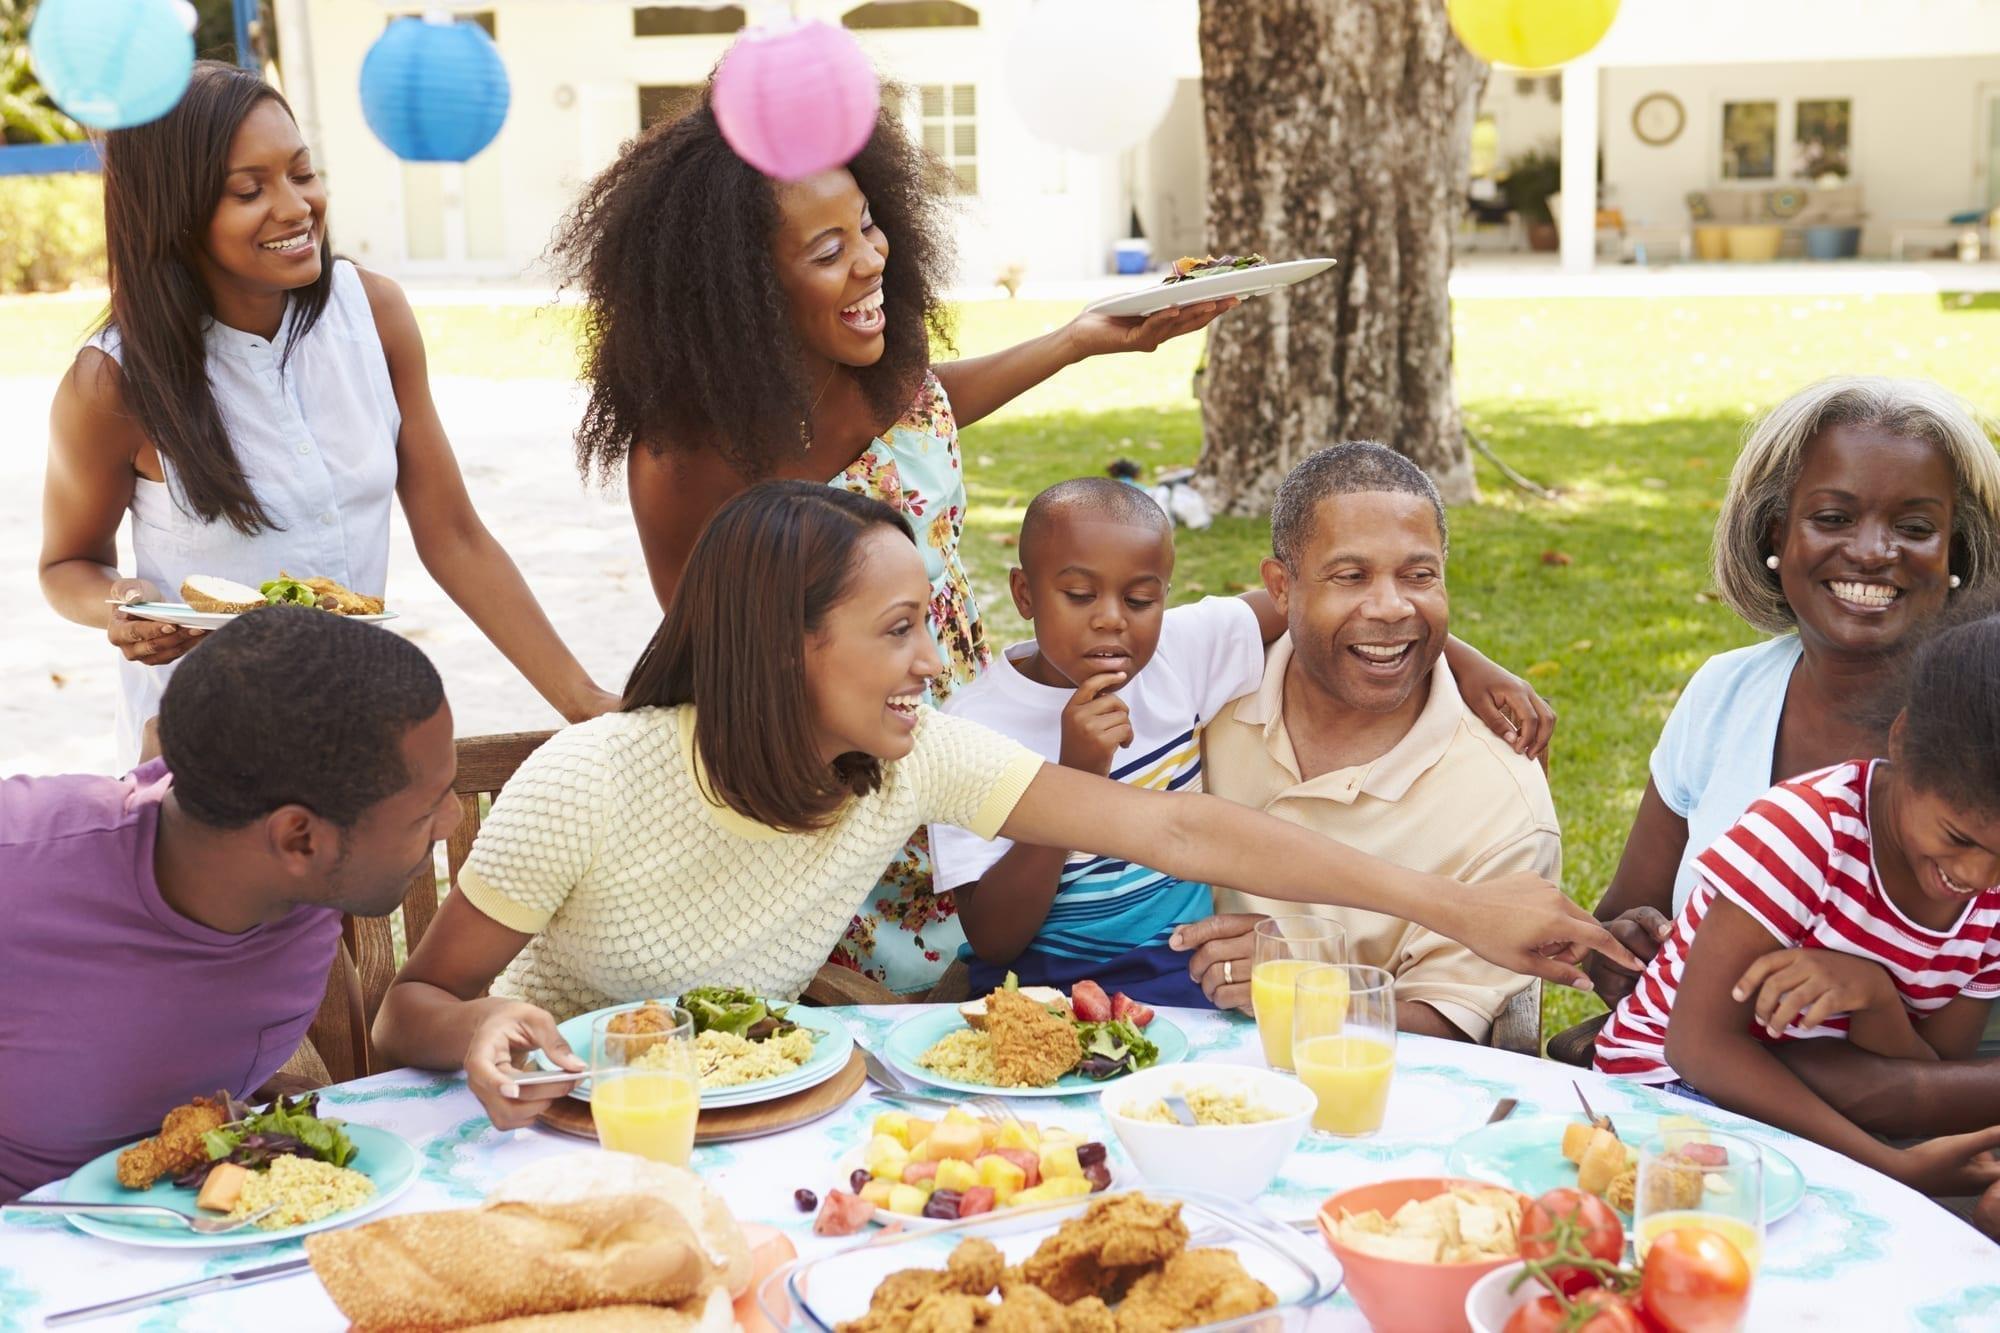 family laughing, eating, having part outside